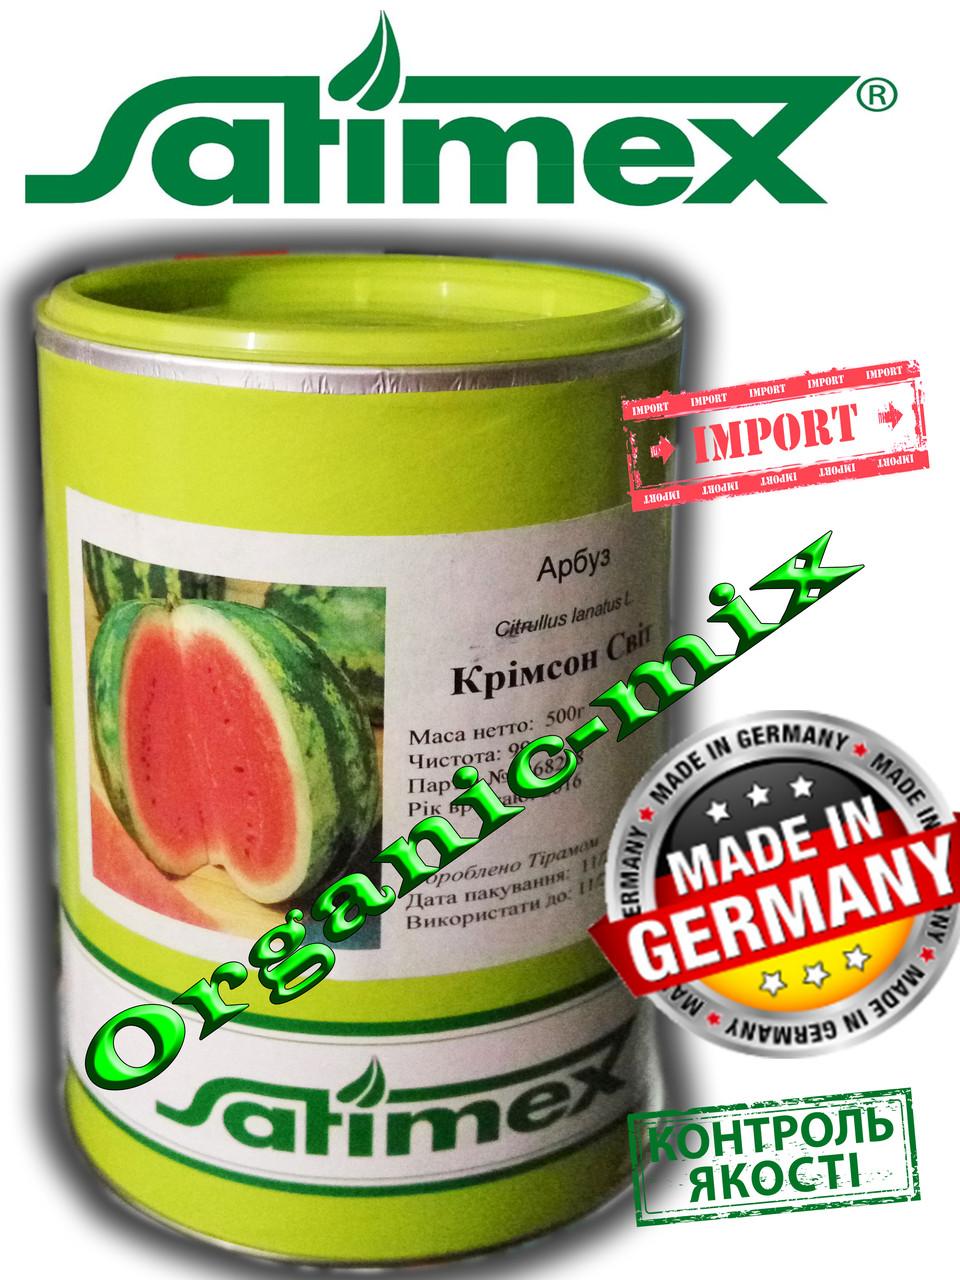 КРИМСОН СВИТ семена арбуза, ТМ Satimex (Германия), банка 500 грамм (фасовка Германия)